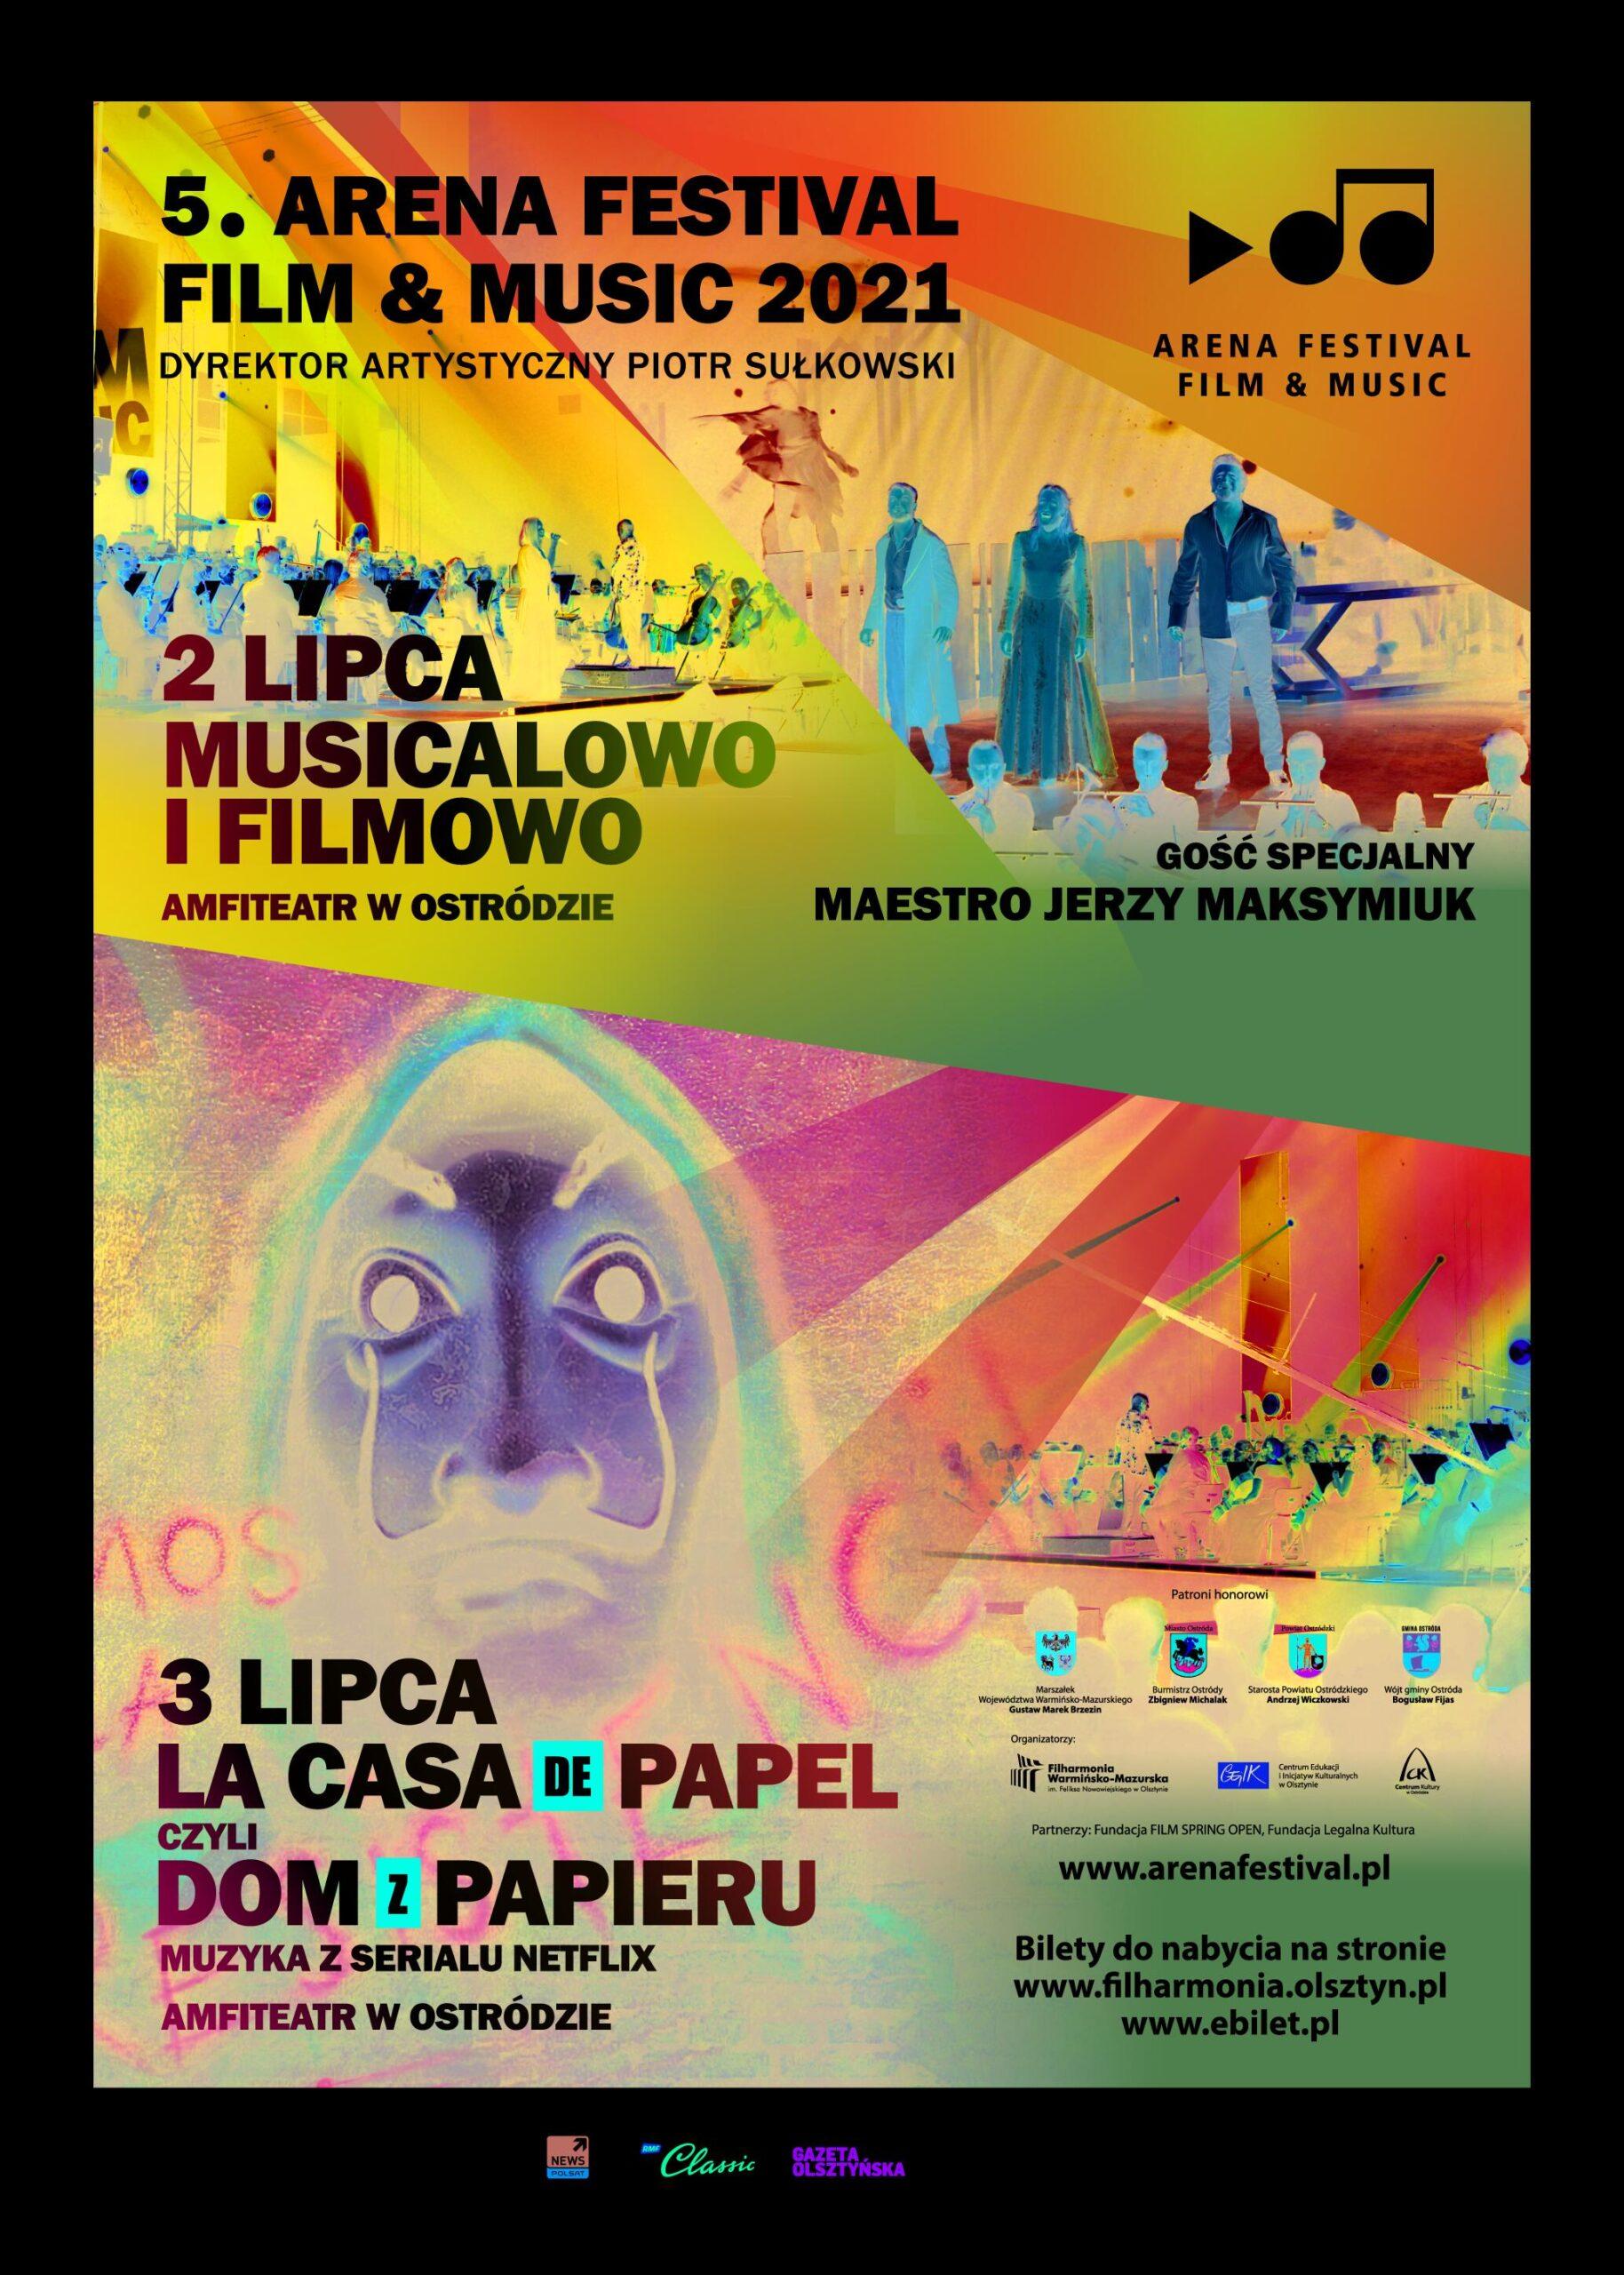 ARENA FESTIVAL FILM & MUSIC JUŻ 2 I 3 LIPCA W OSTRÓDZIE